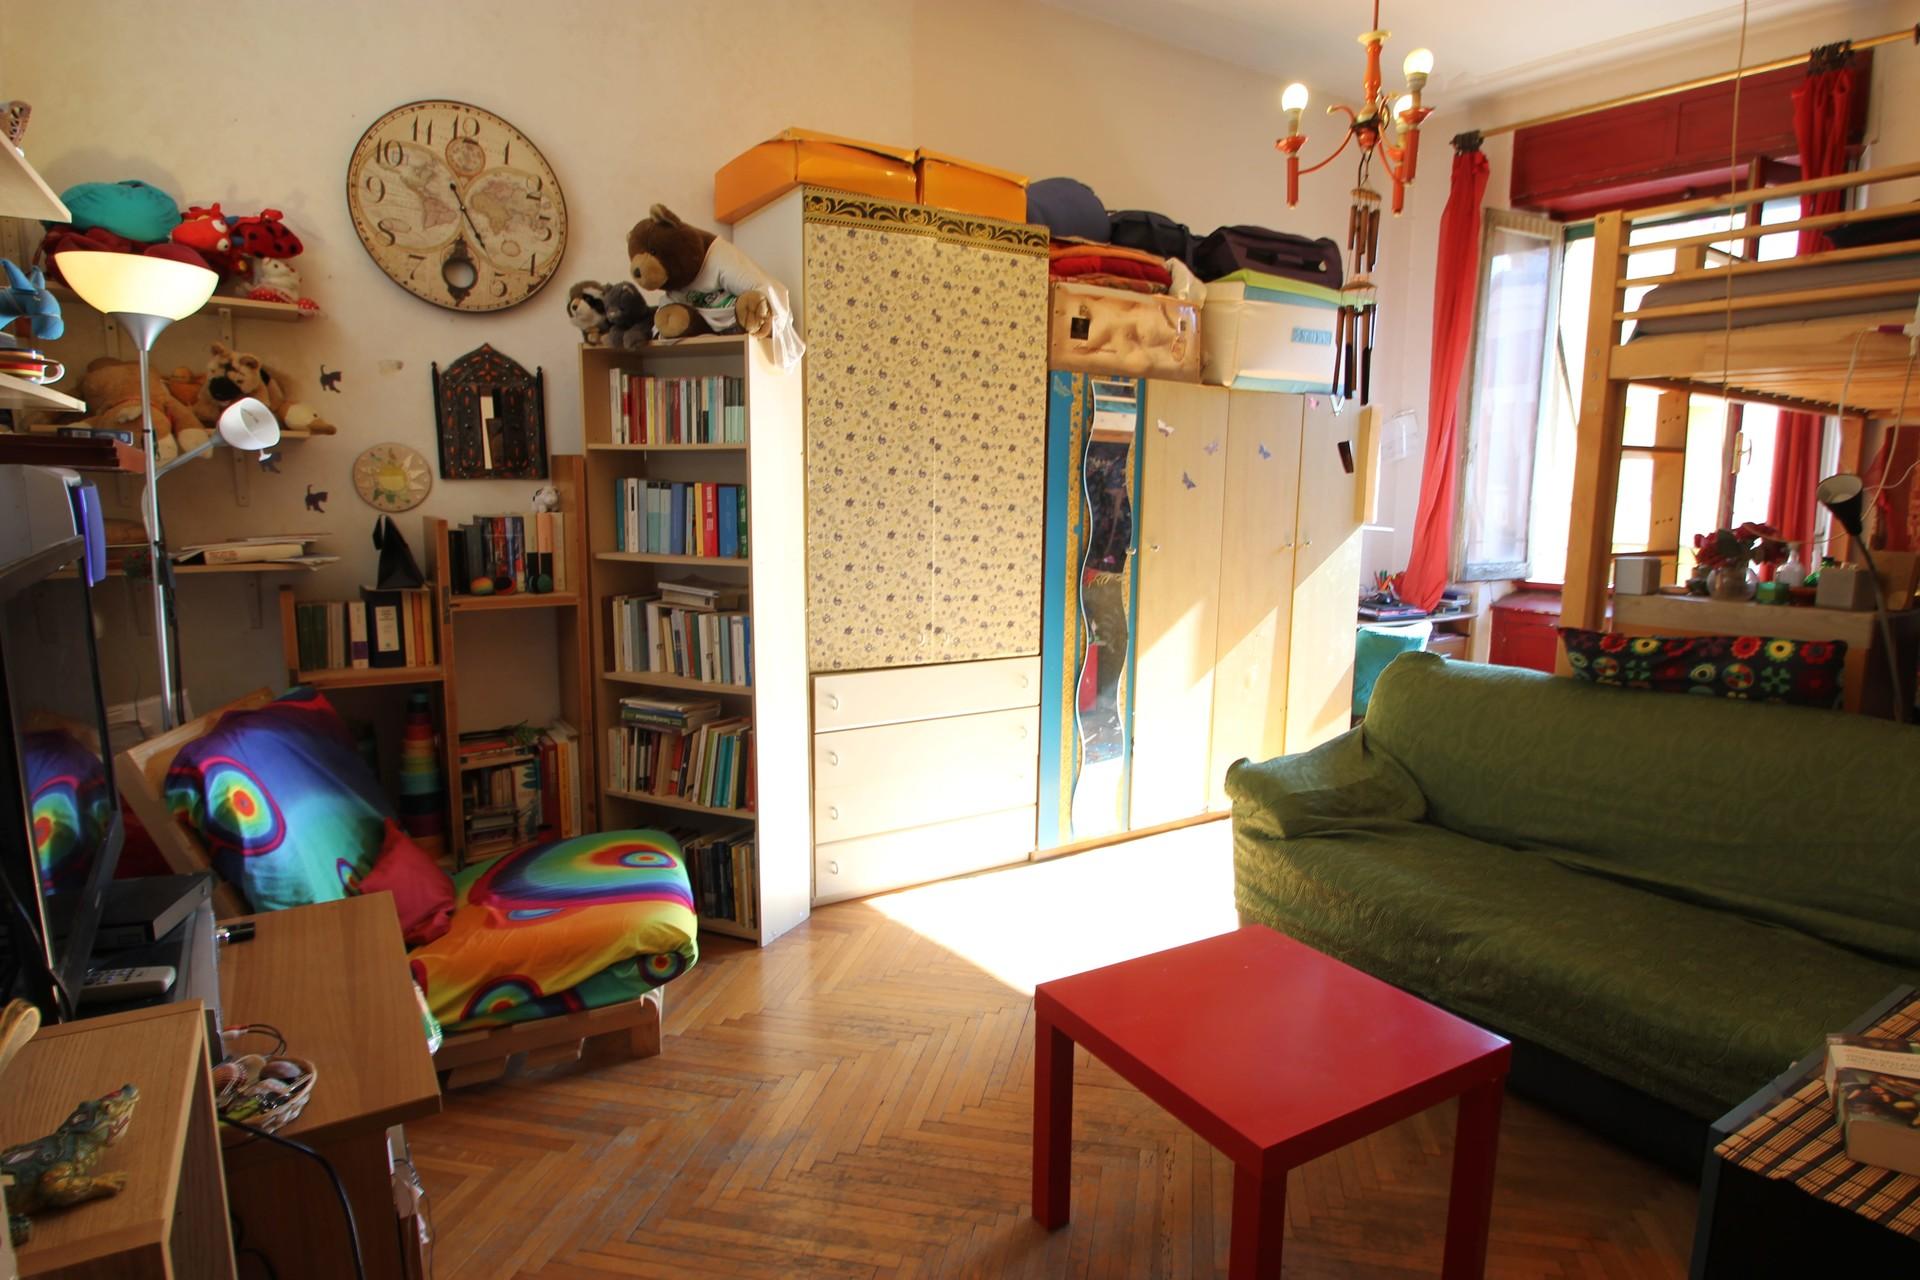 large-sunny-rooms-rome-near-metro-san-giovanni-02d762f6067fdd553d7babf67d6549a1